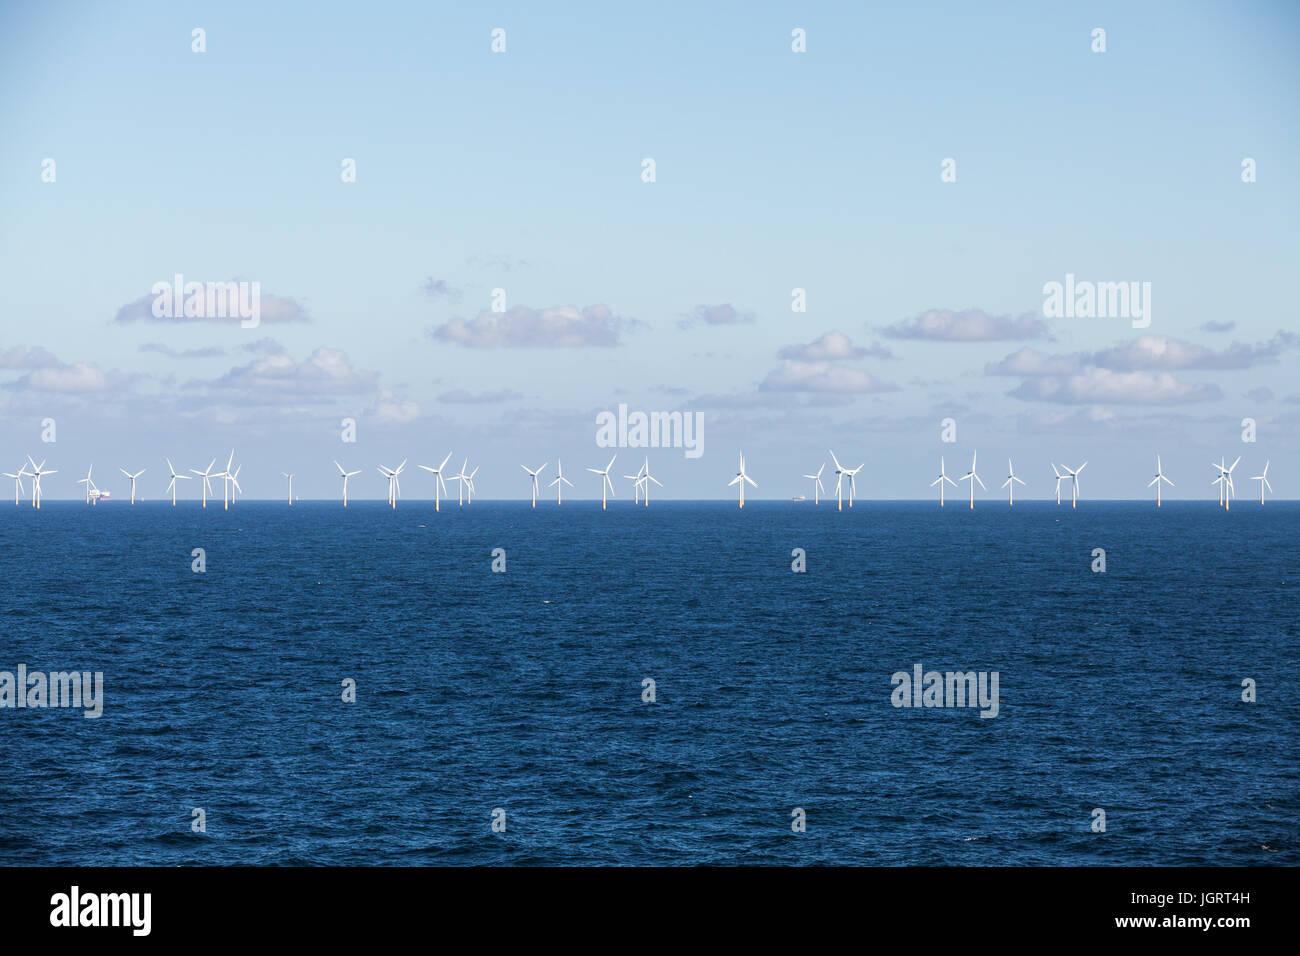 Offshore wind farm - Stock Image